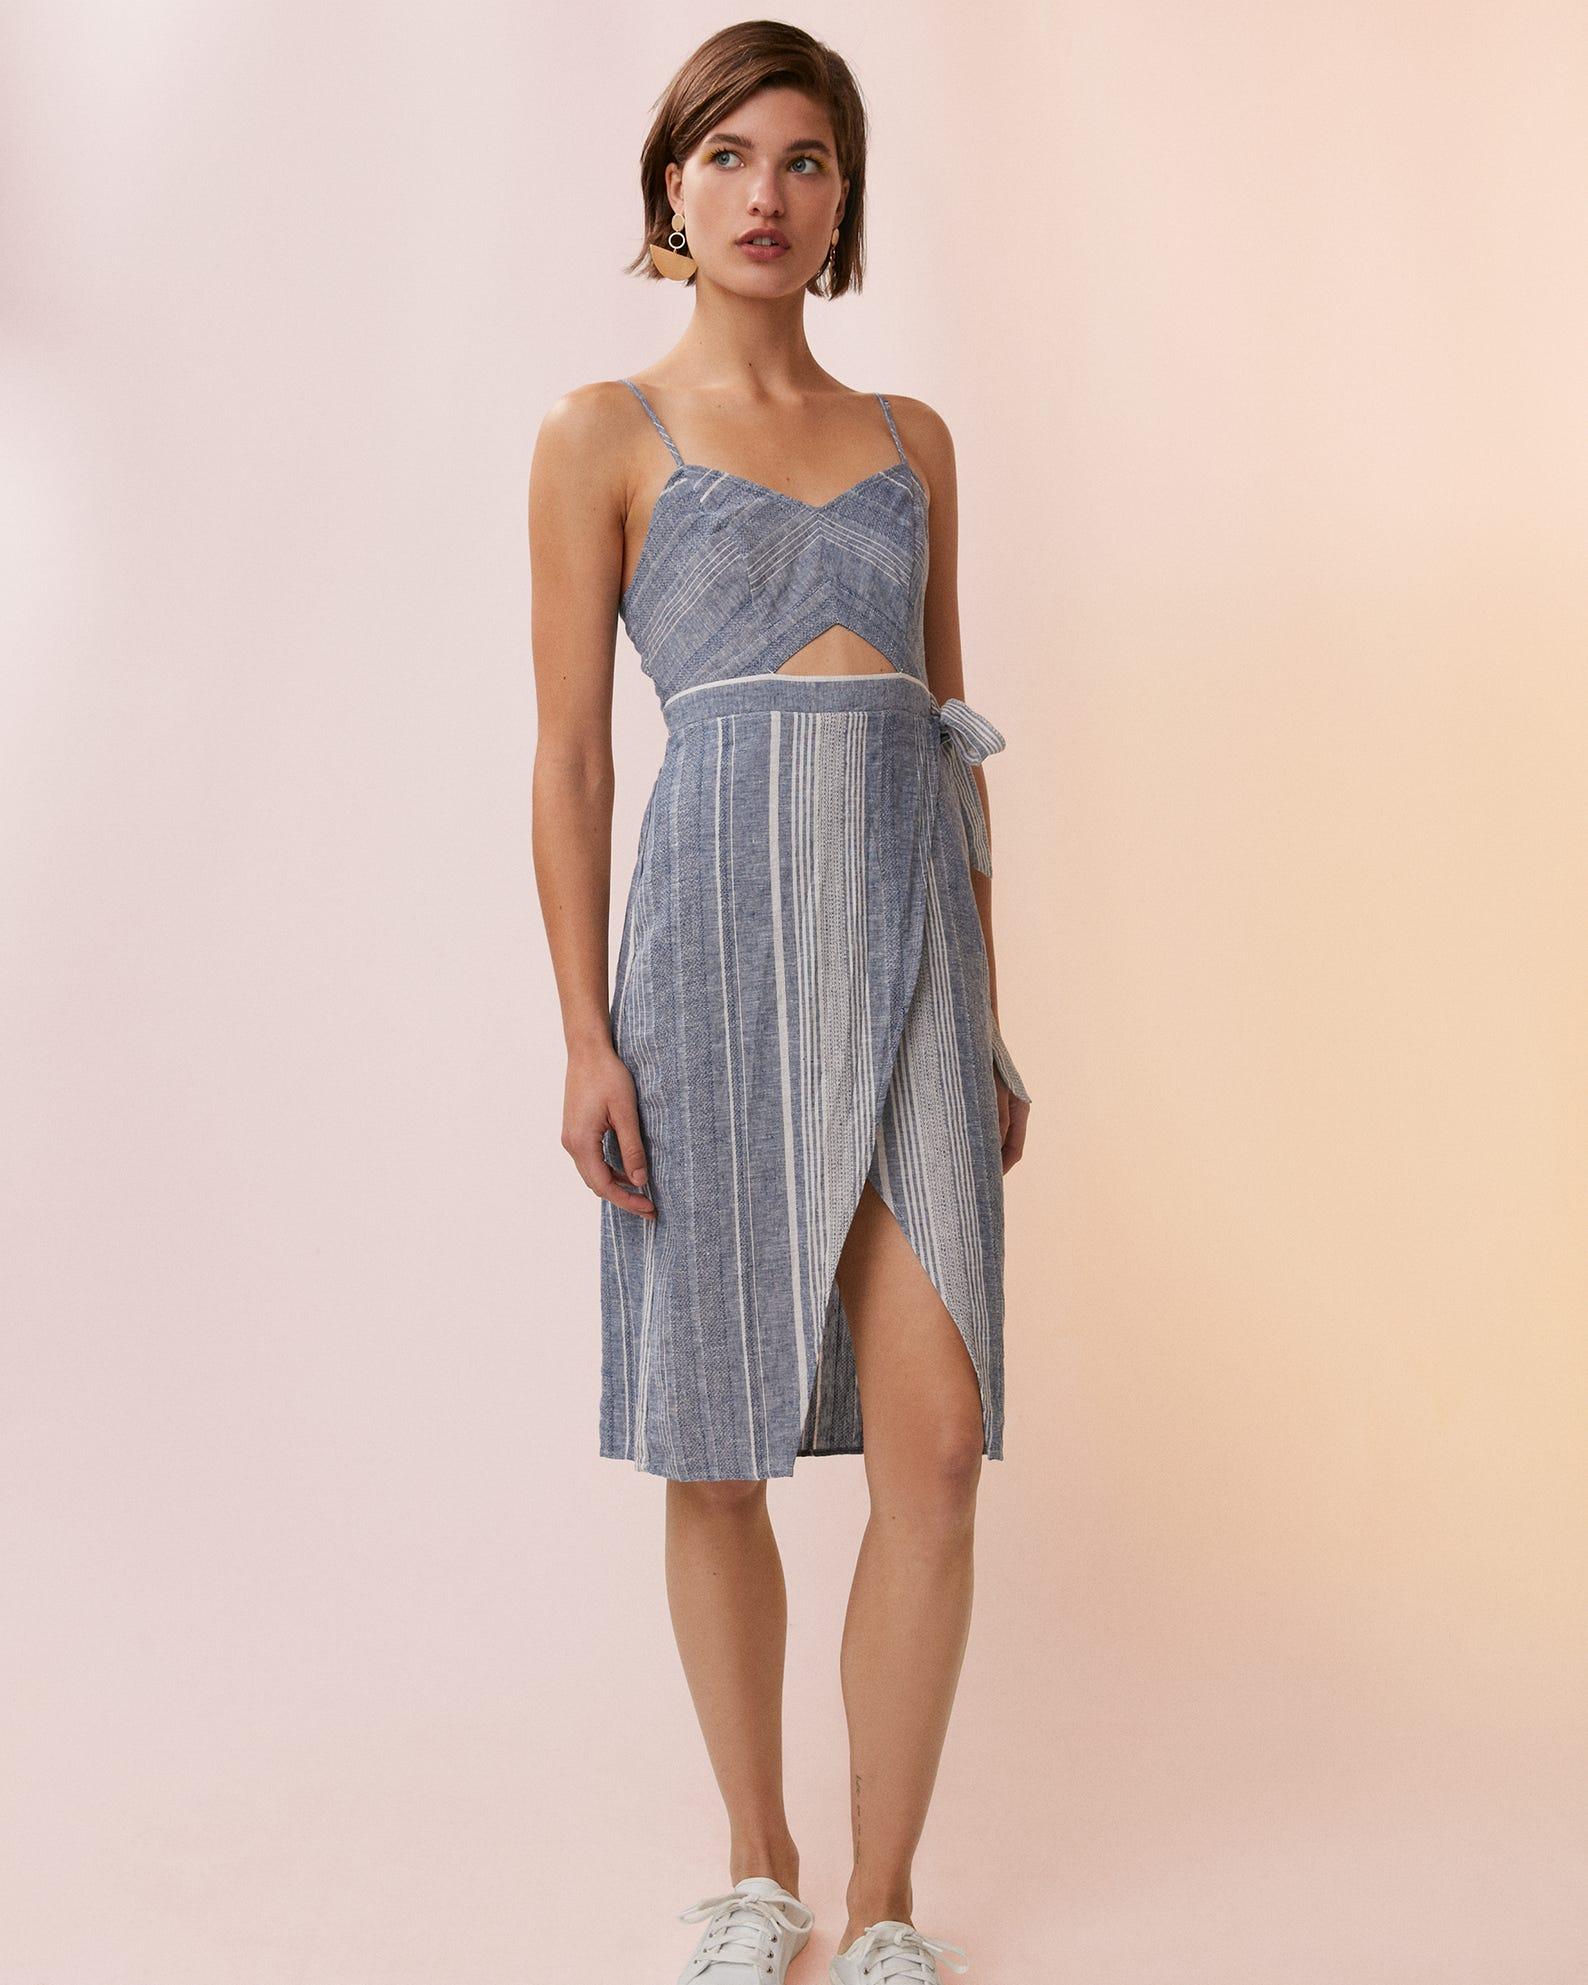 86e007f0b2 30 effortless sundresses you ll wear all summer